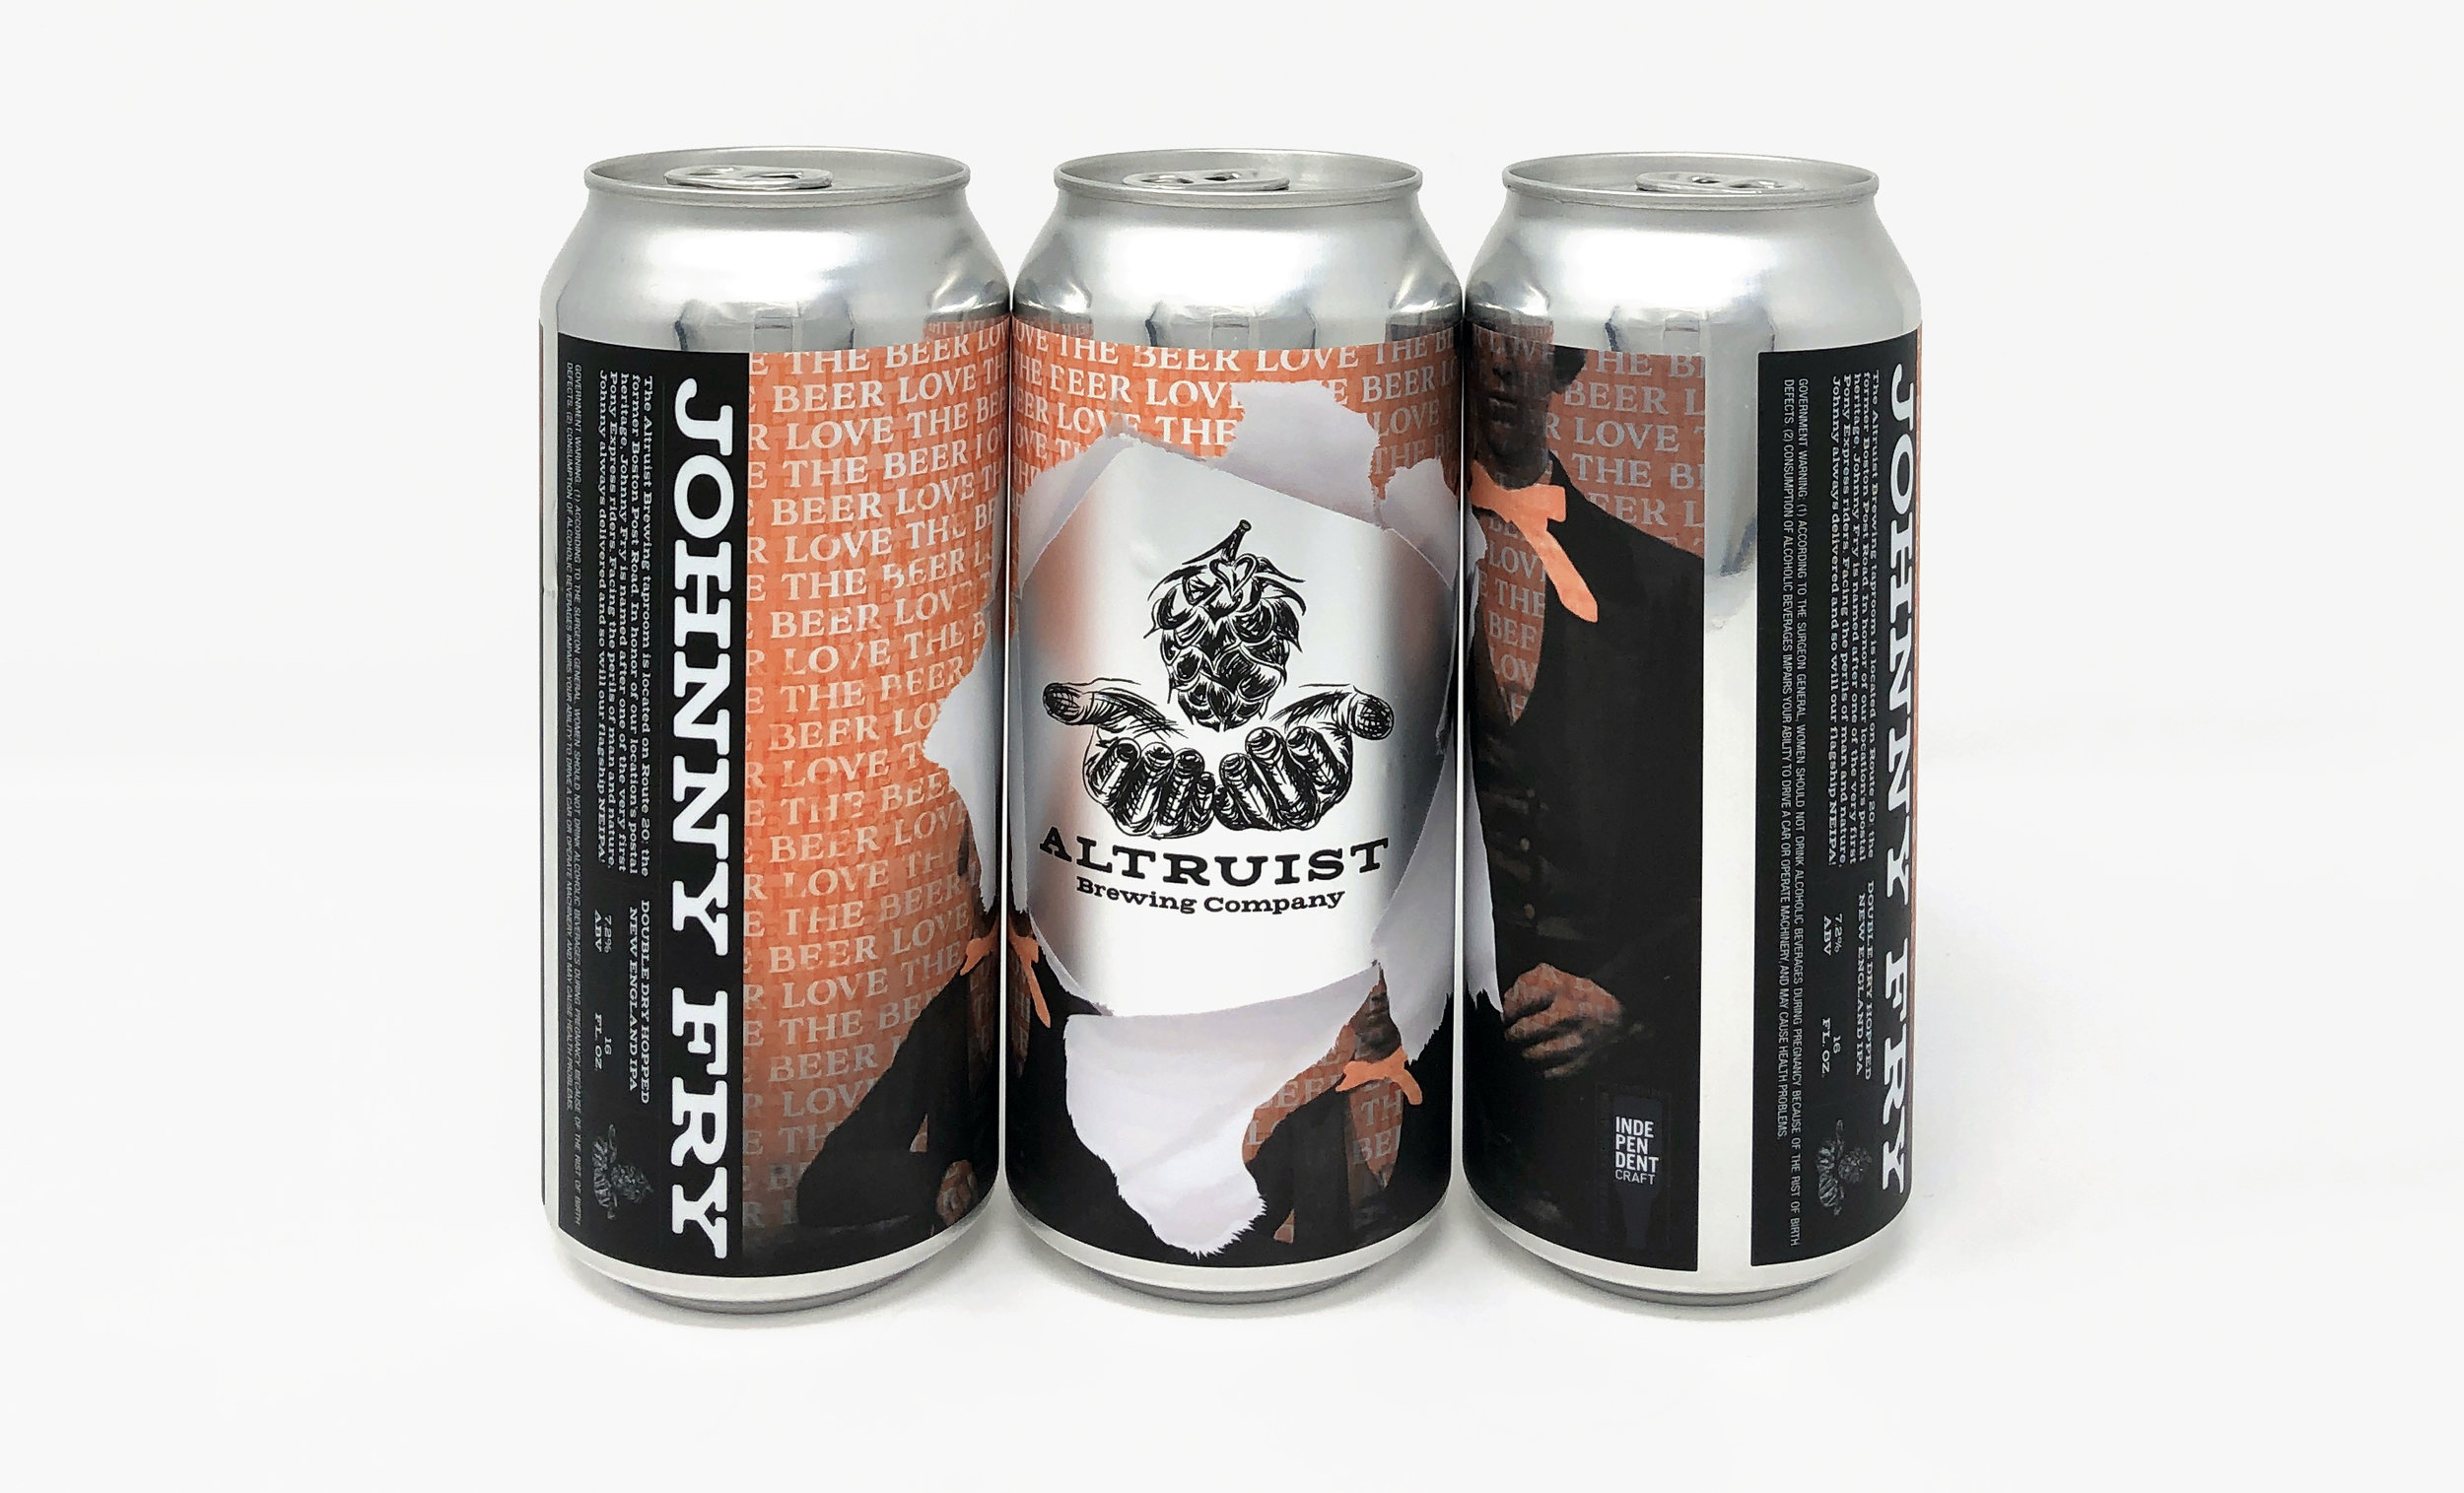 Studio-Eighty-Seven-Branding-Logo-Design-Altruist-Brewing-Company-Label-Design.jpg